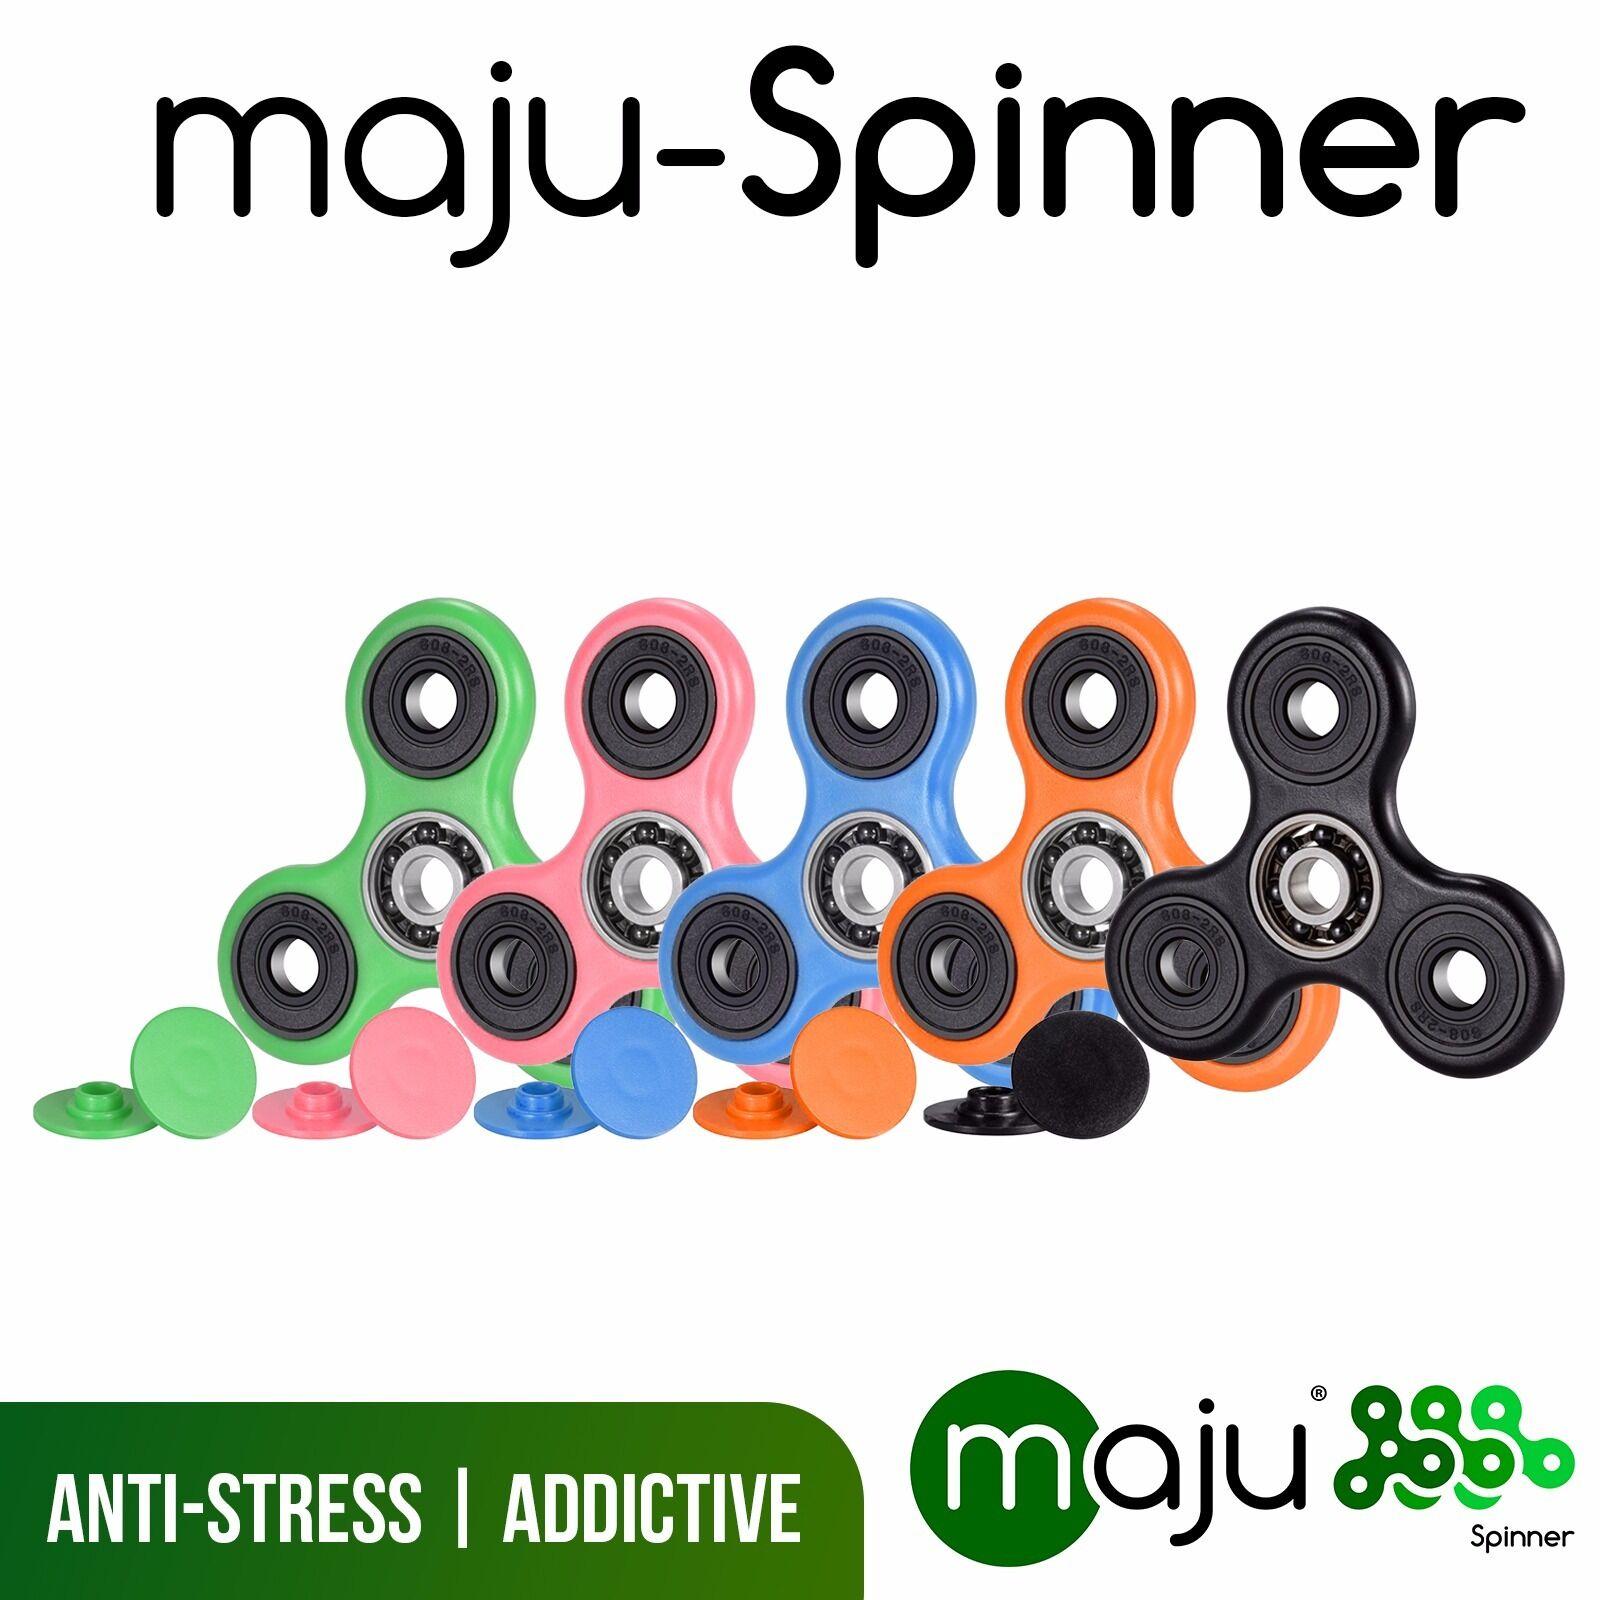 100  pezzi x uomoo Spinner dito Spinner Kreisel anti fidget anti stress individuaticome ed.  edizione limitata a caldo